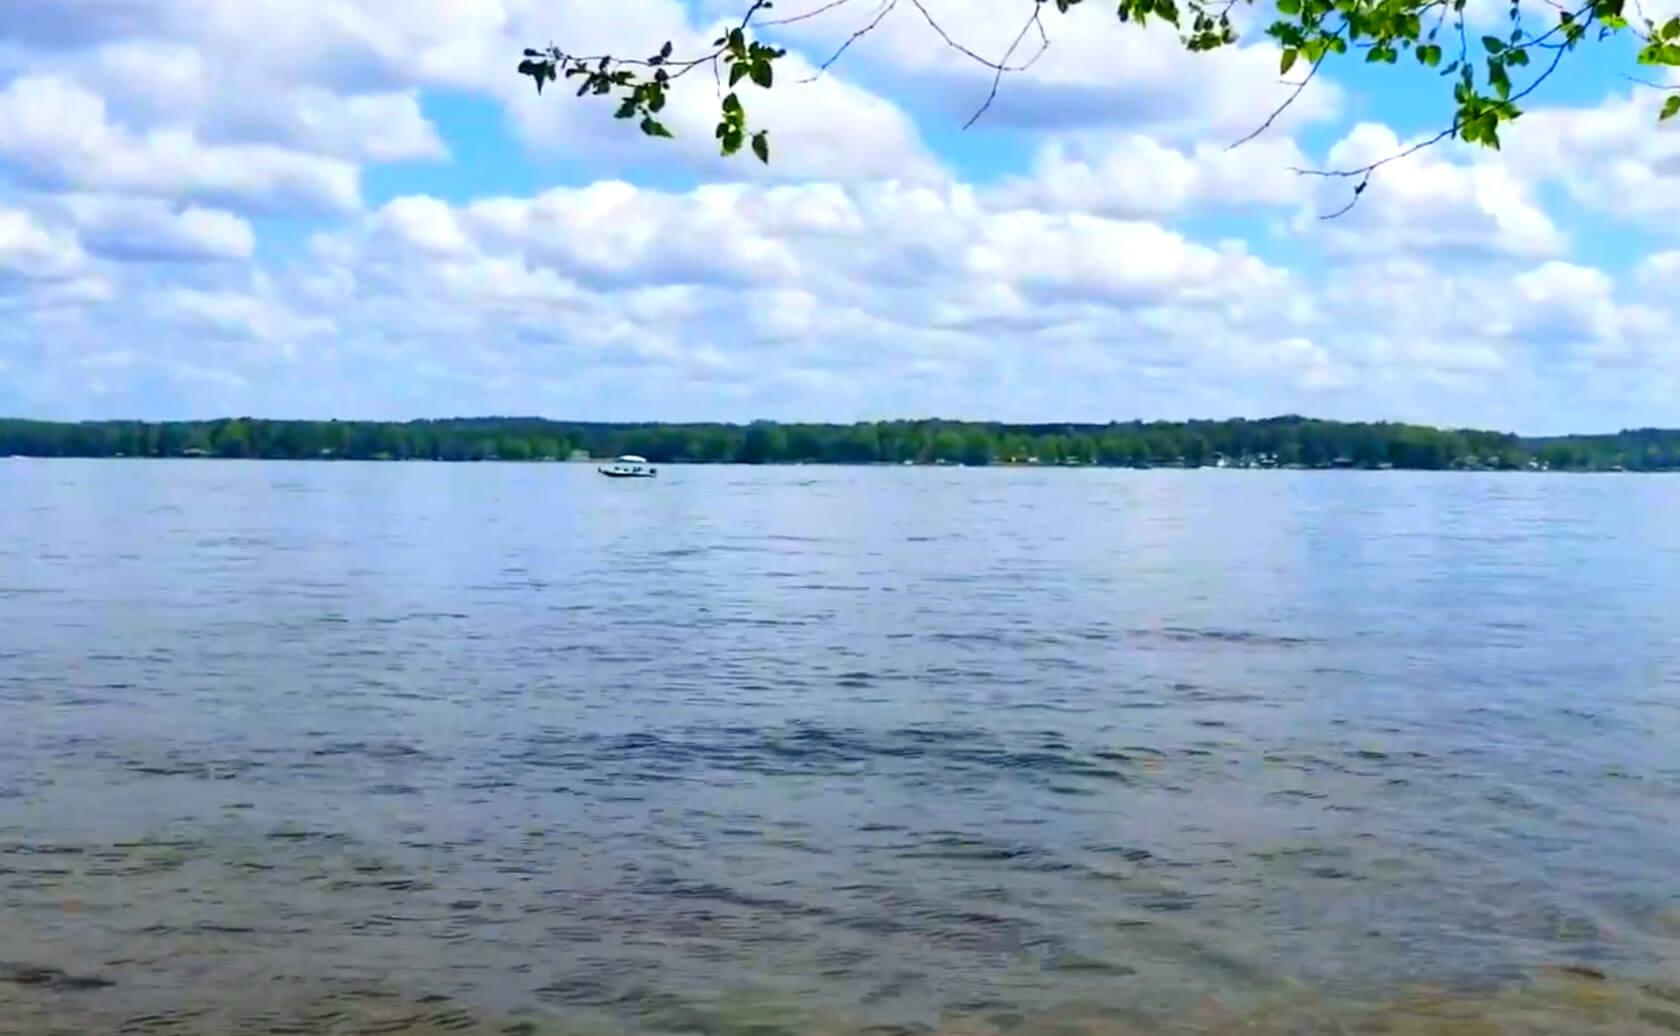 Greenwood-Lake-Fishing-Guide-Report-South-Carolina-05